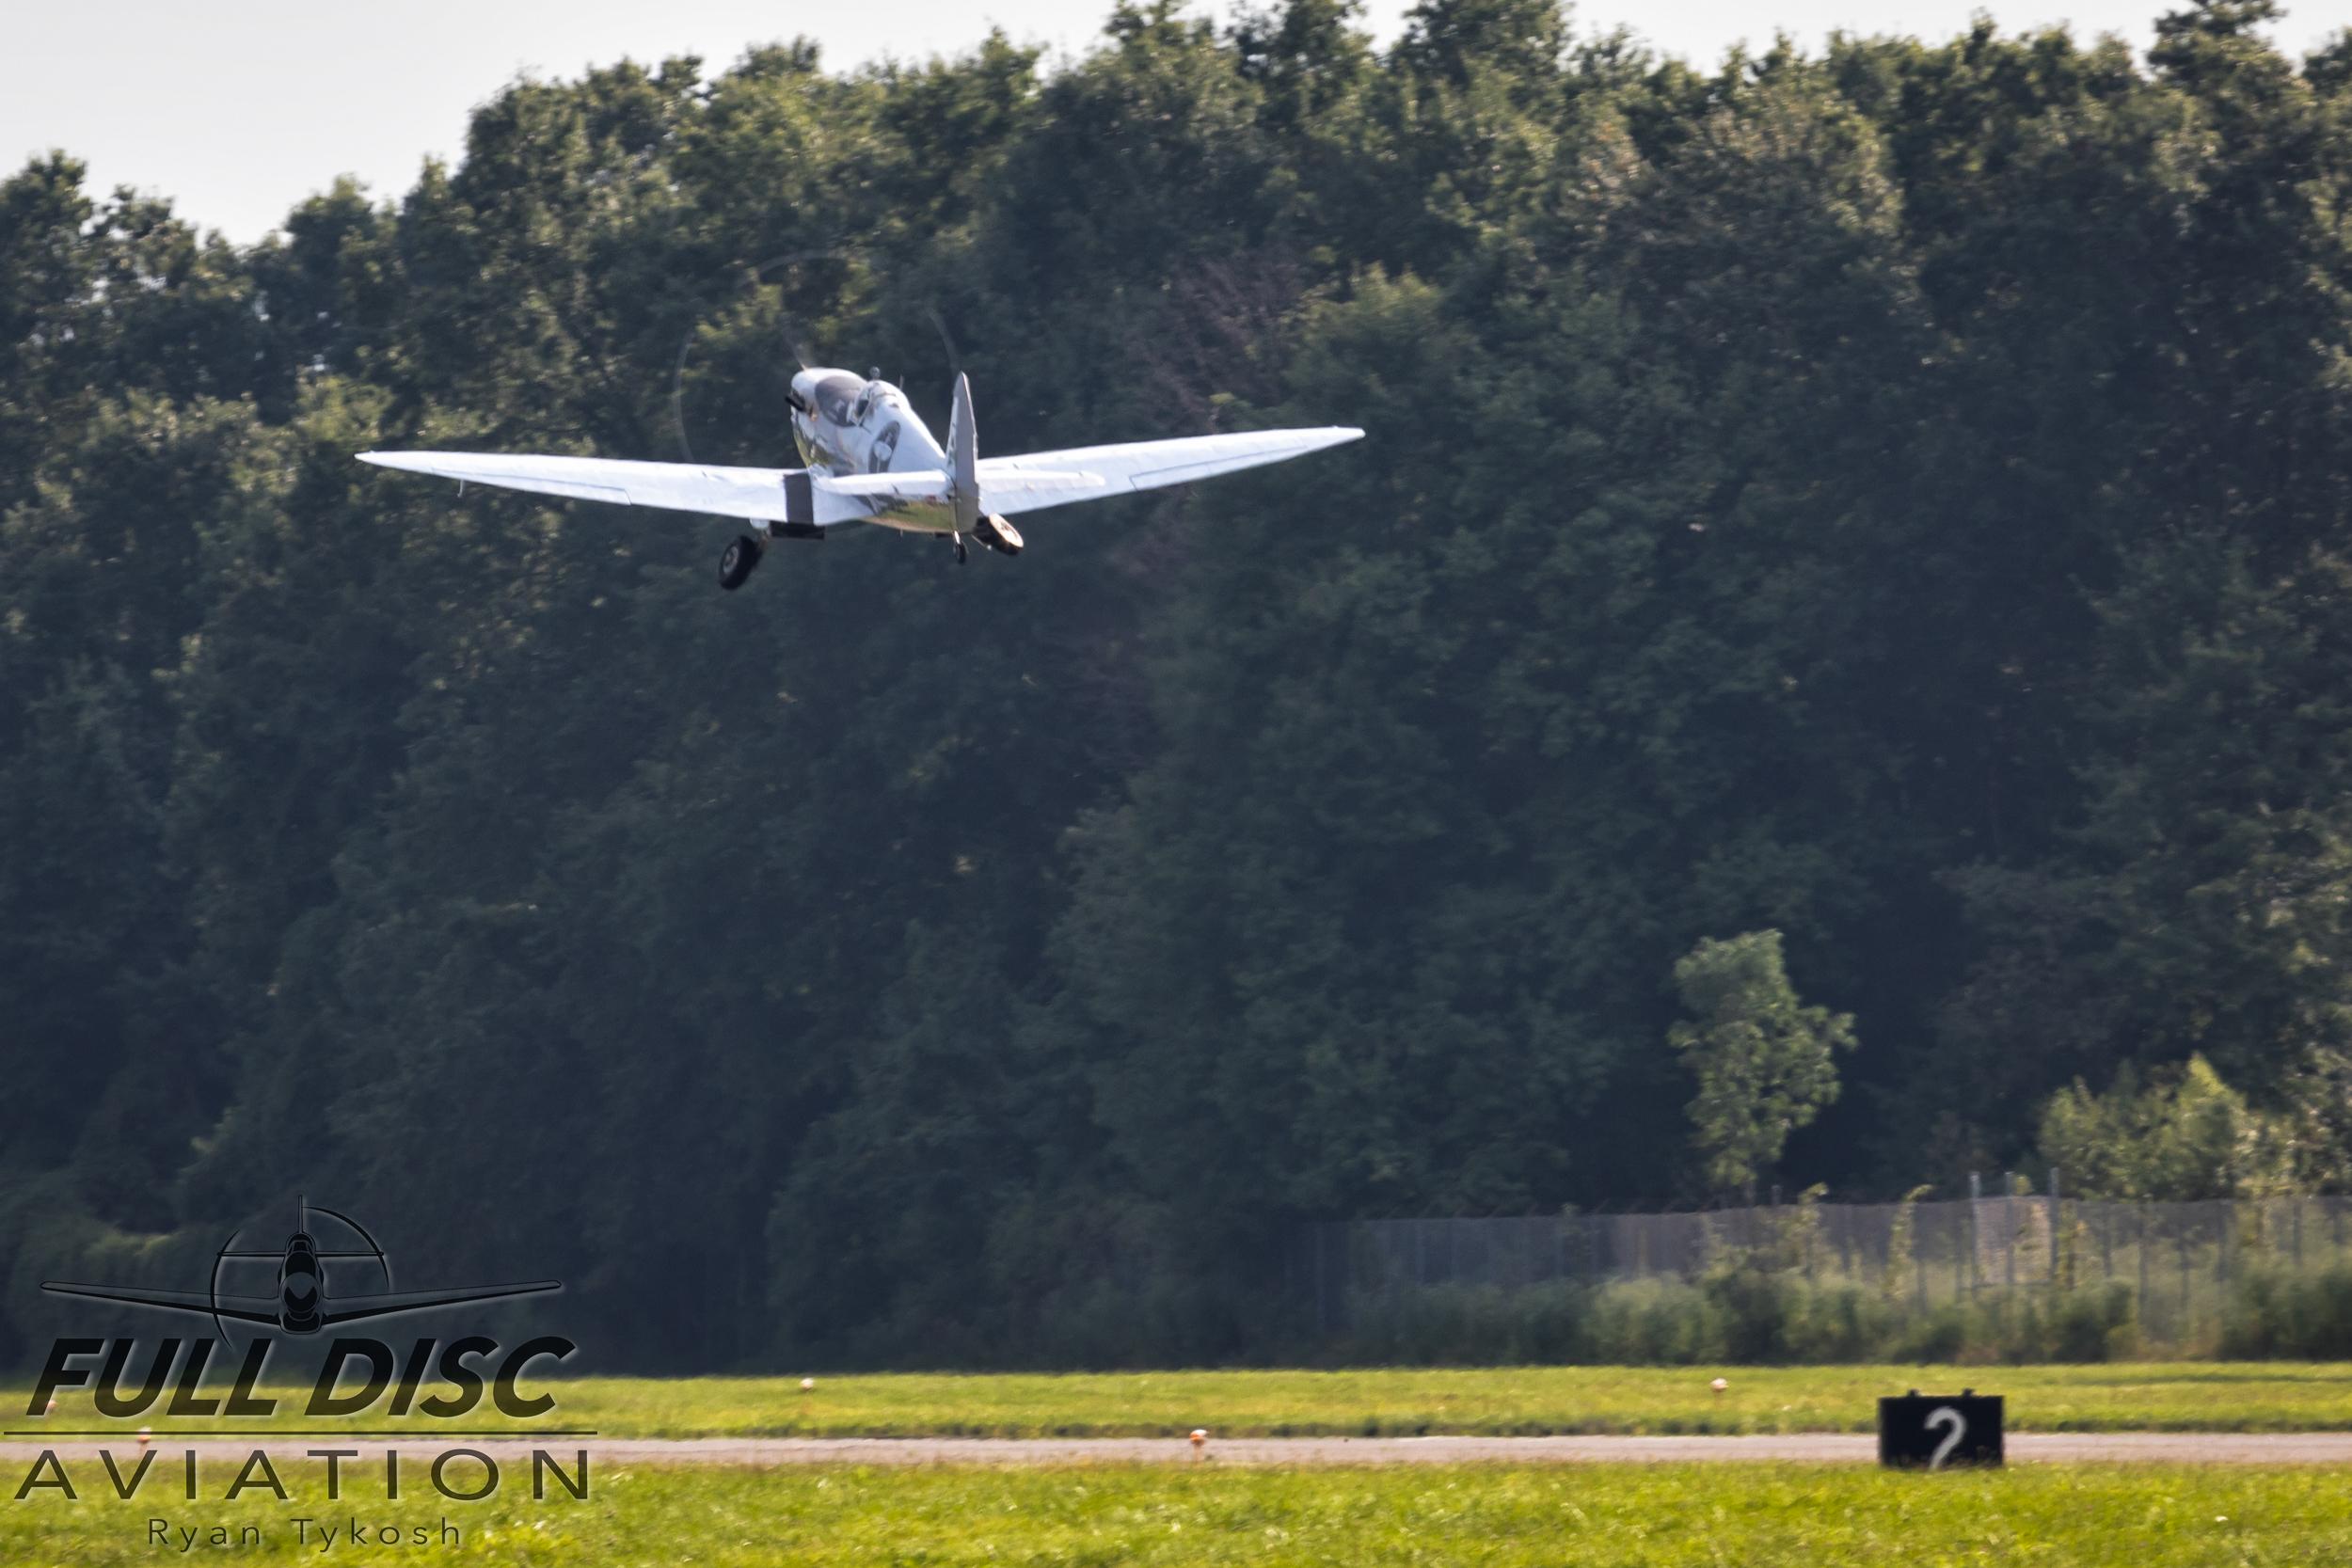 Silver Spitfire - Full Disc Aviation - Ryan Tykosh_August 21, 2019_11.jpg